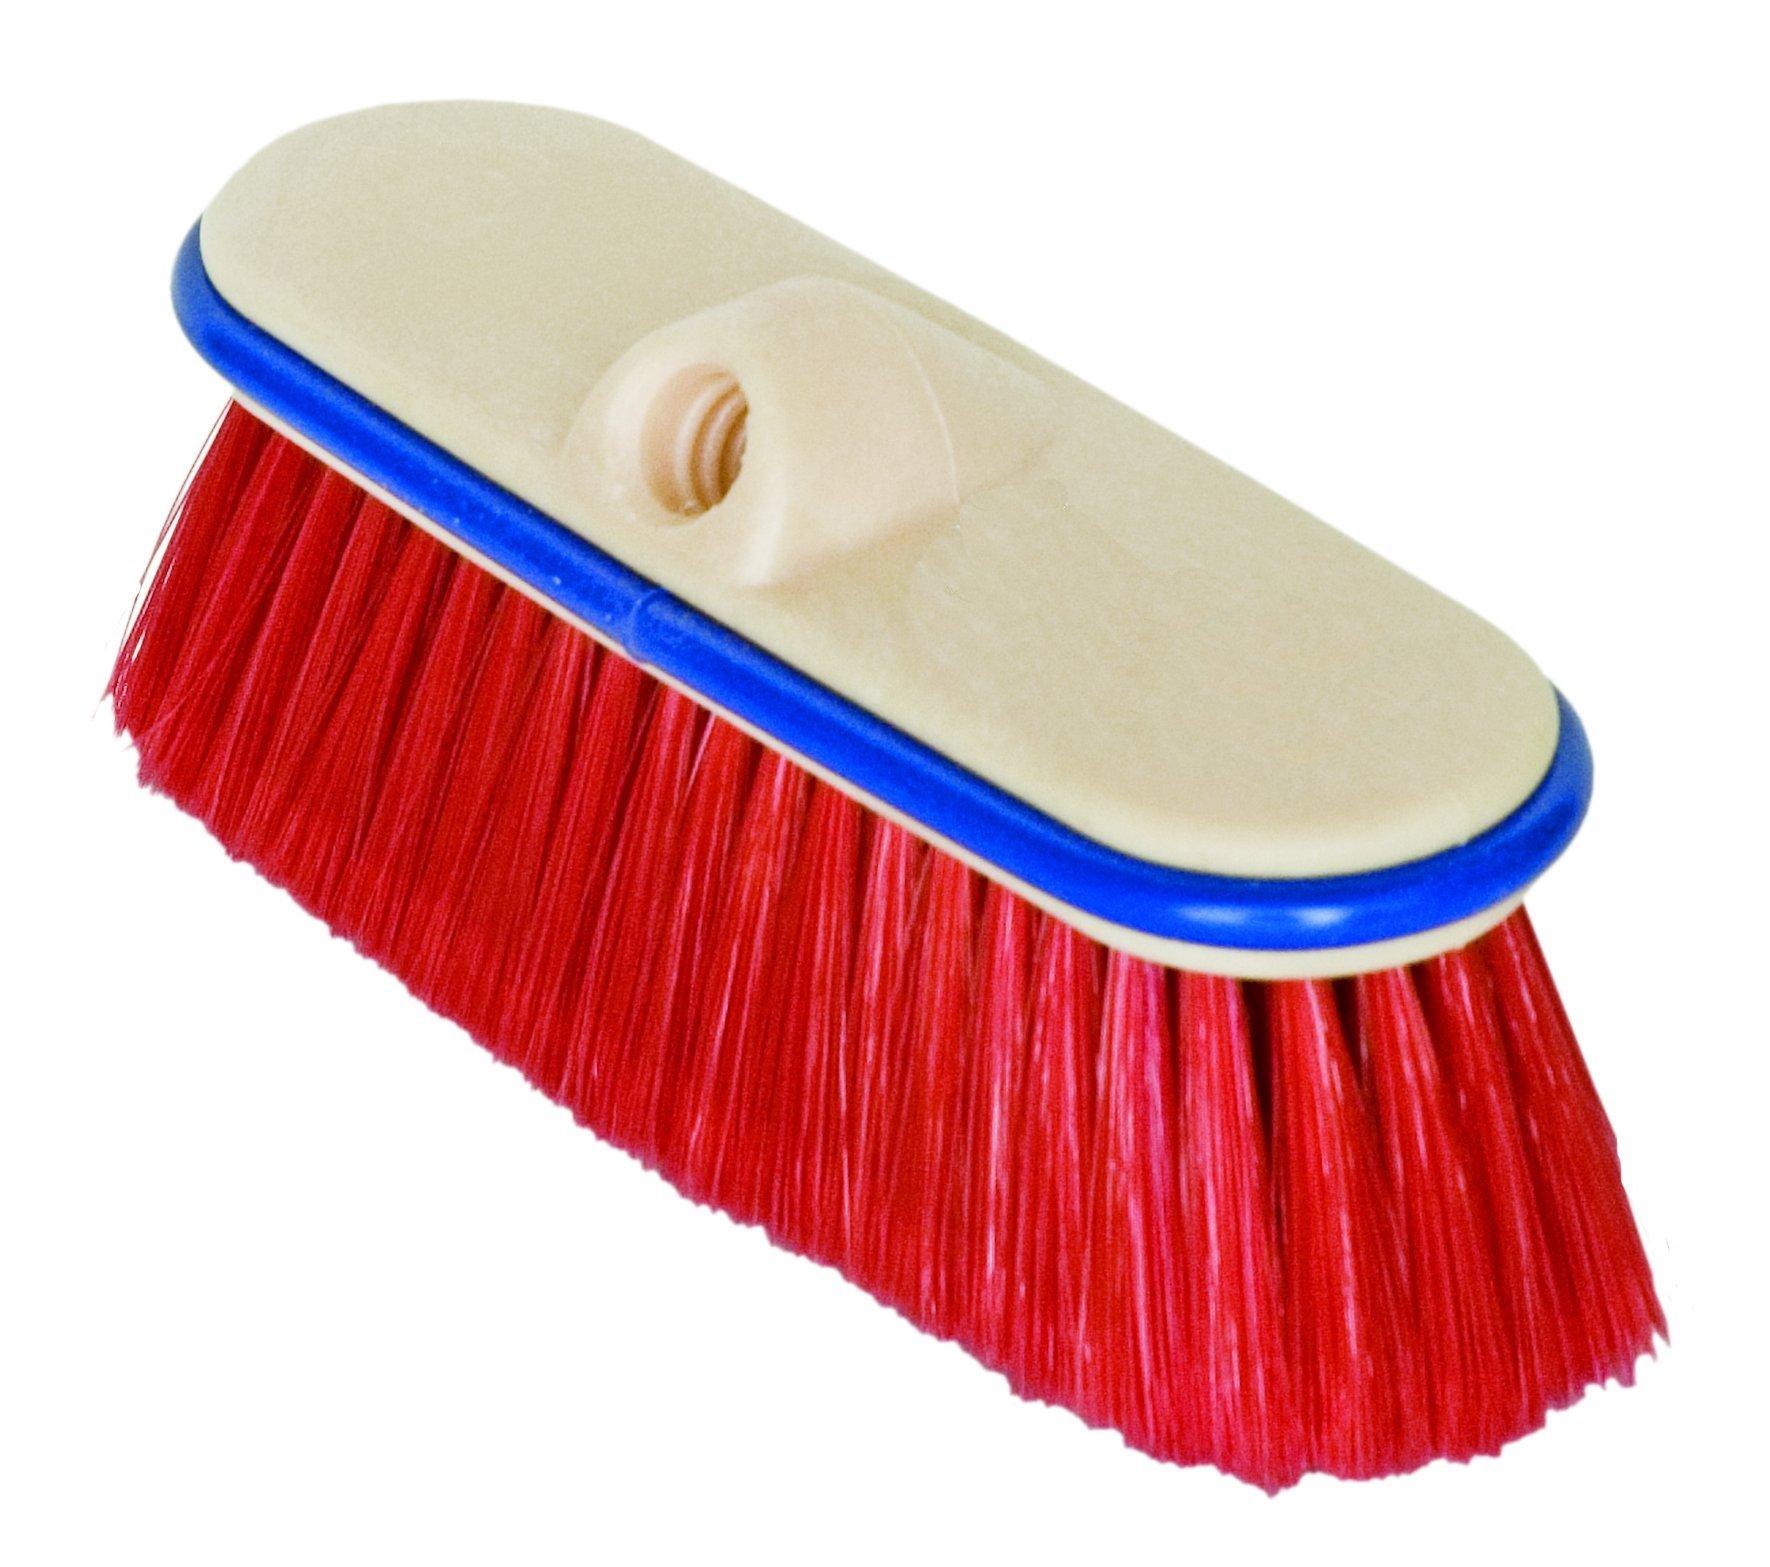 Magnolia Brush 3046 Ultra Block Truck Wash Brush, Flagged Nylon Bristles, 2-1/2'' Trim, 9'' Length, Red (Case of 12)